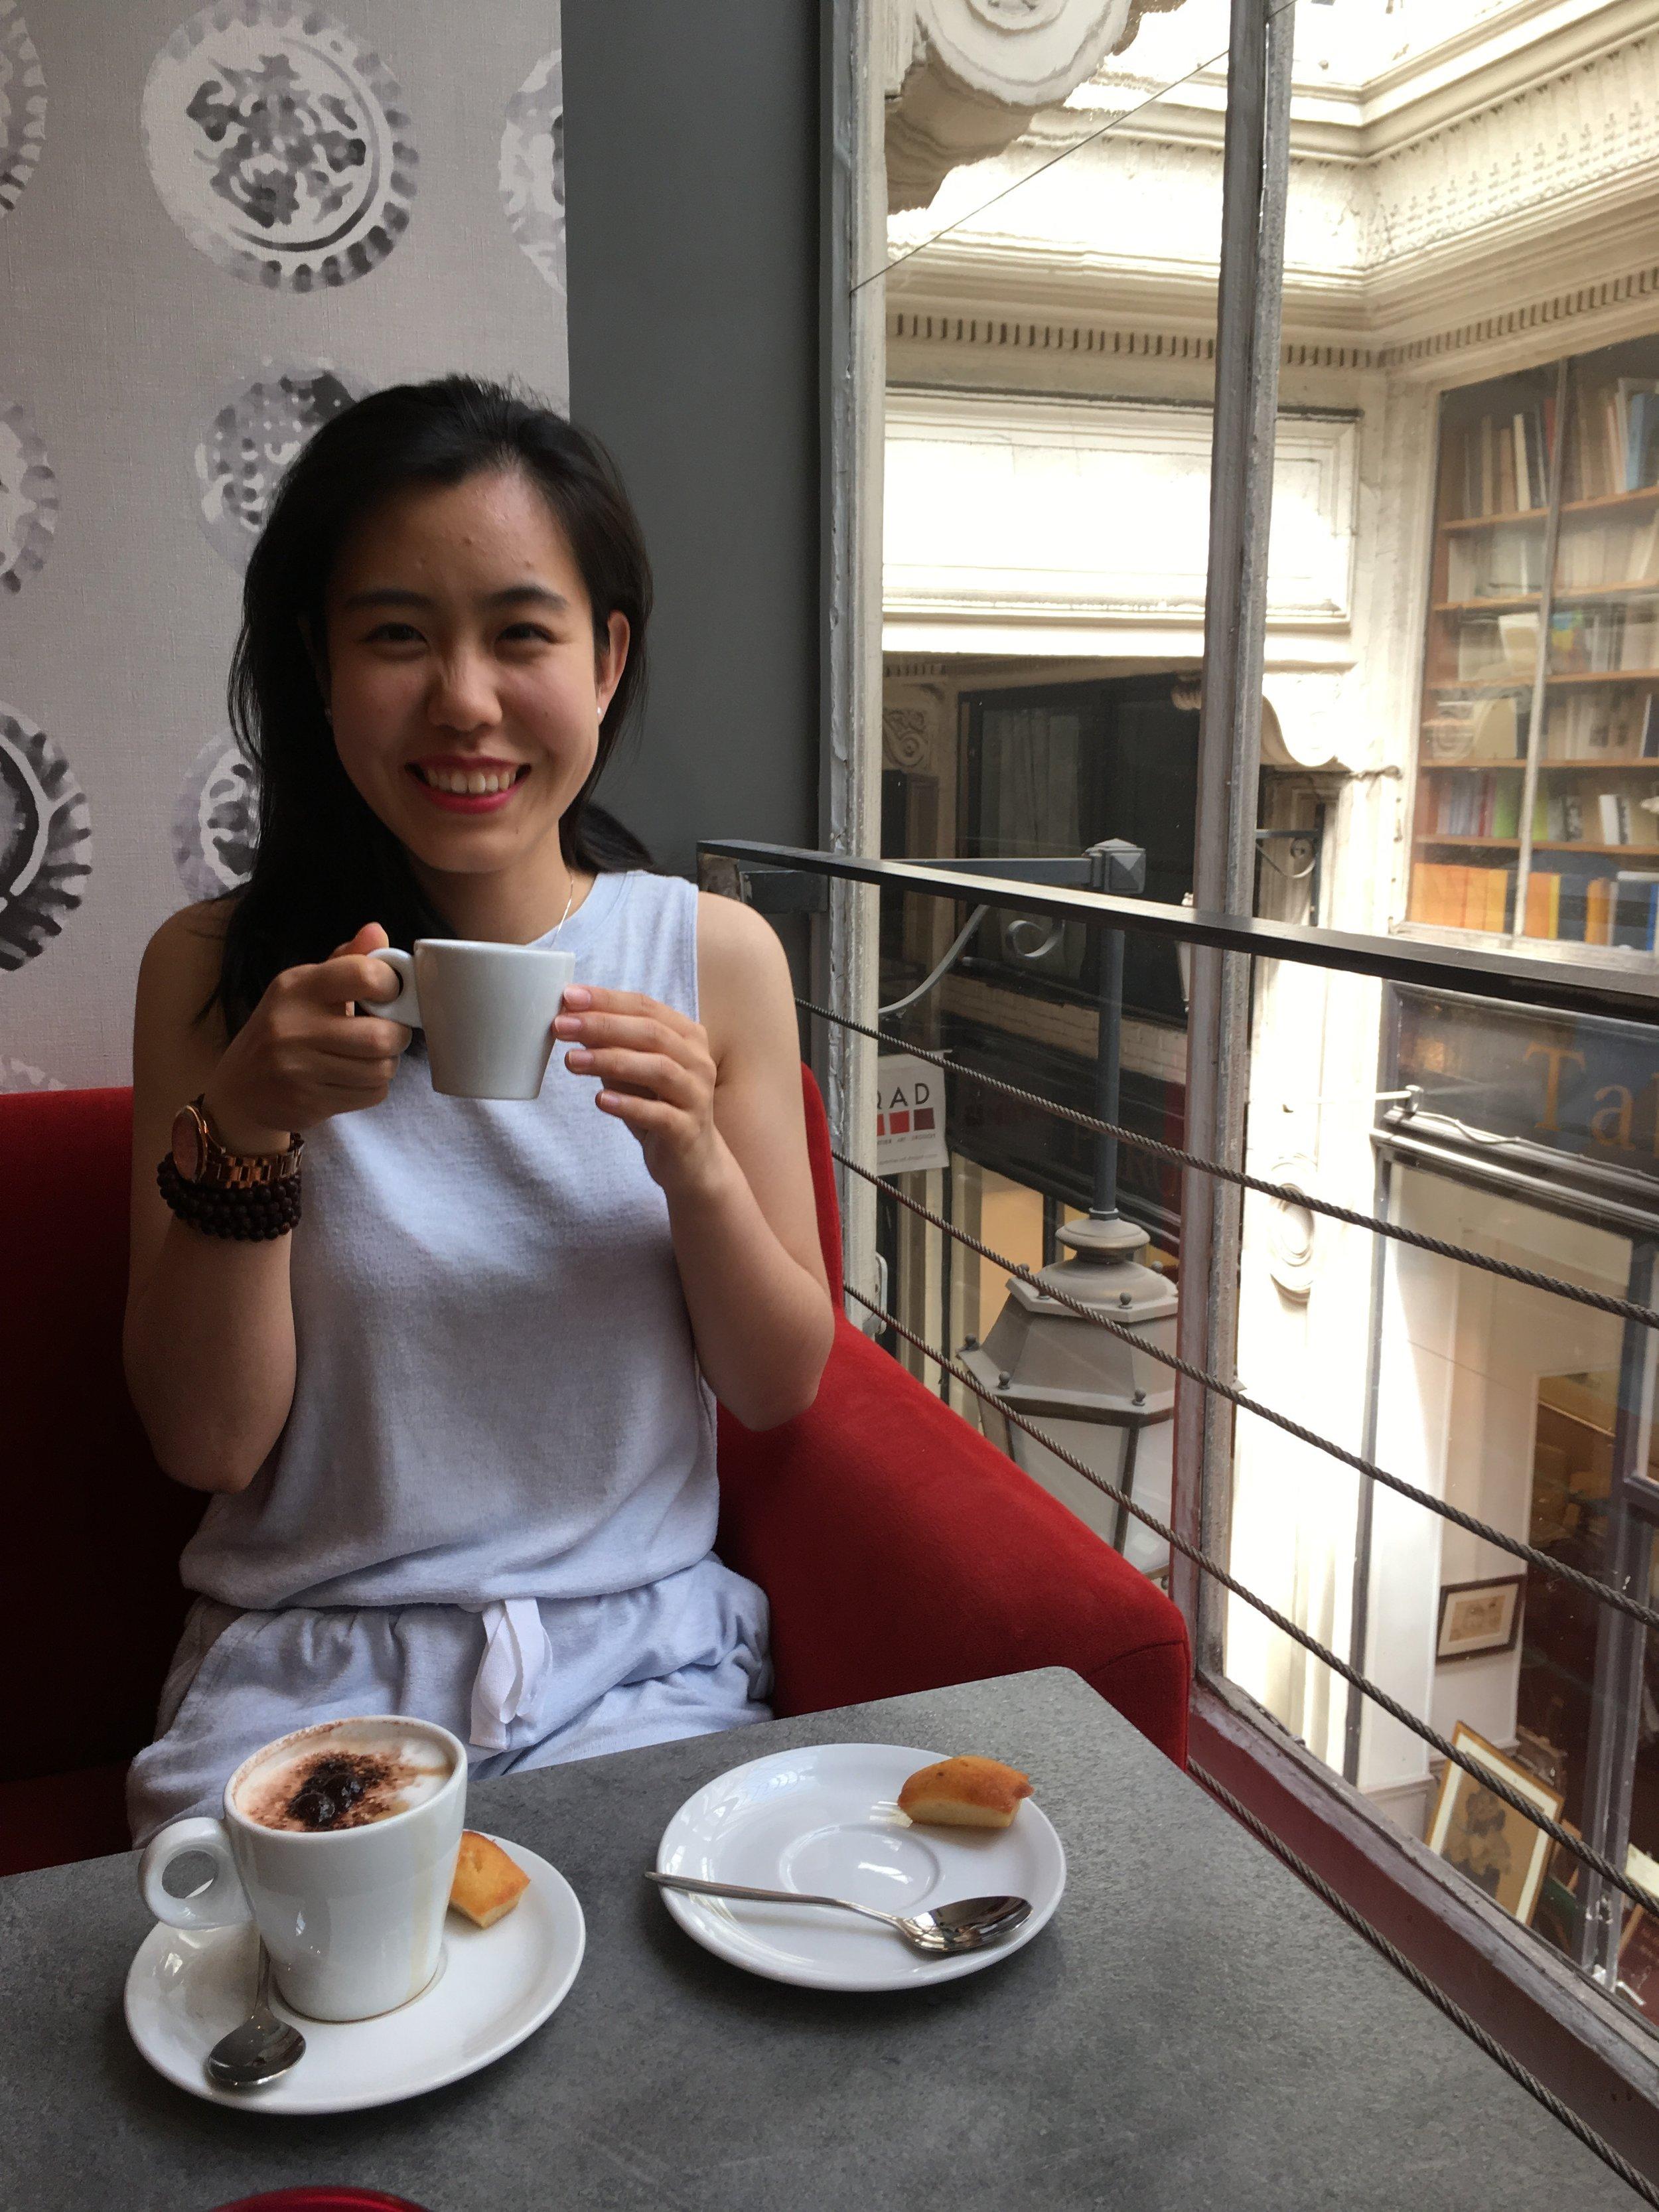 Meet budding art historian and incoming UBC MA student Alice Wang.